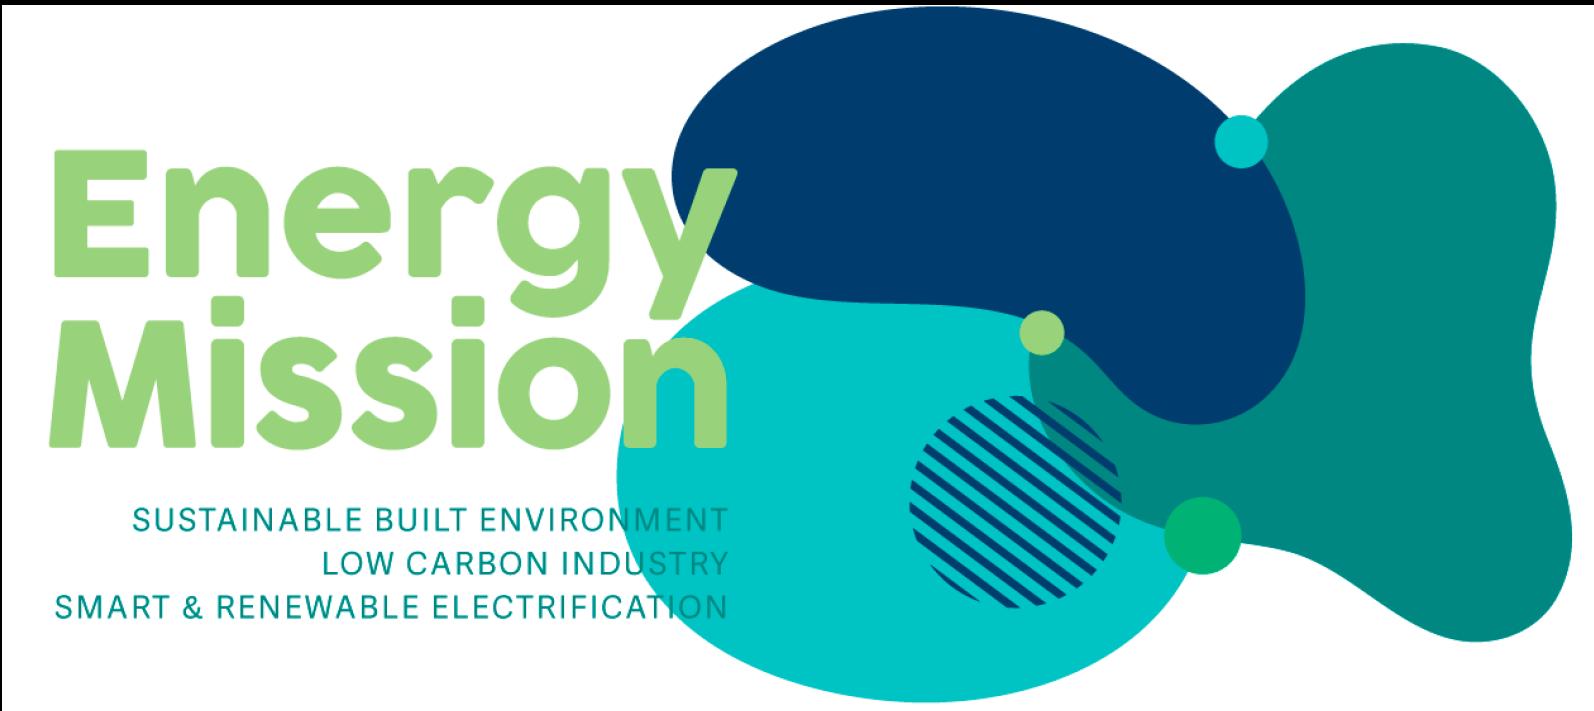 21-22/10/21 Toreon @ Energy Mission